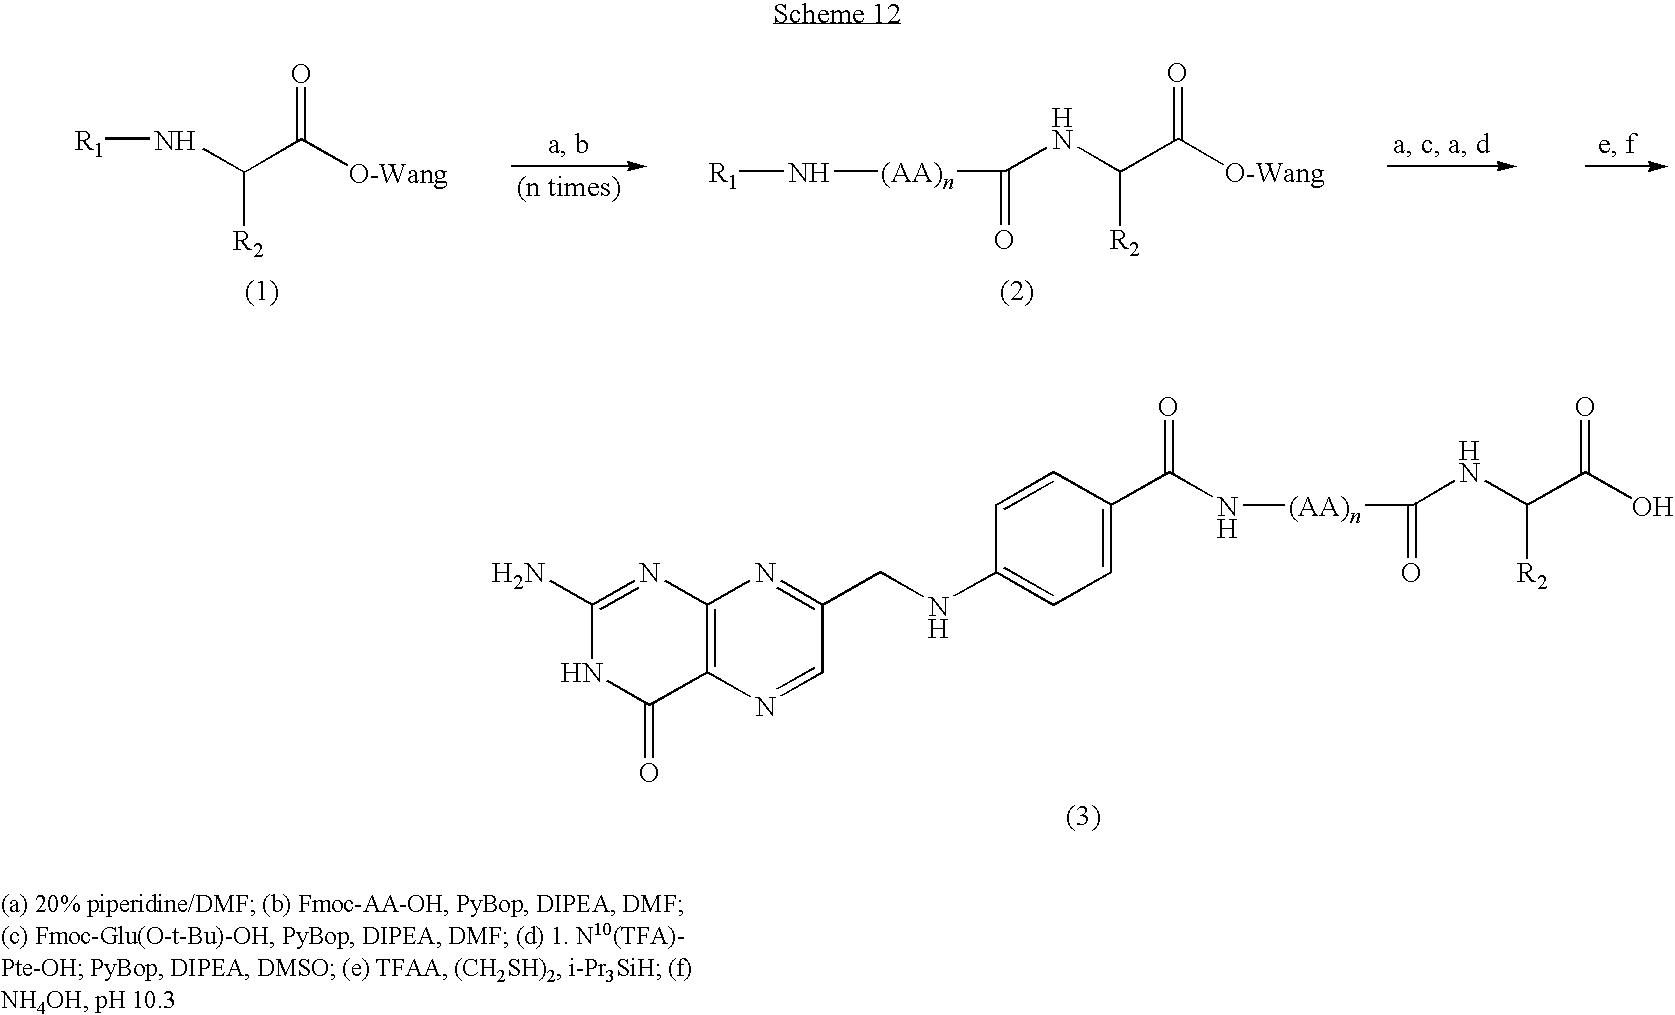 US8105568B2 - Vitamin receptor binding drug delivery